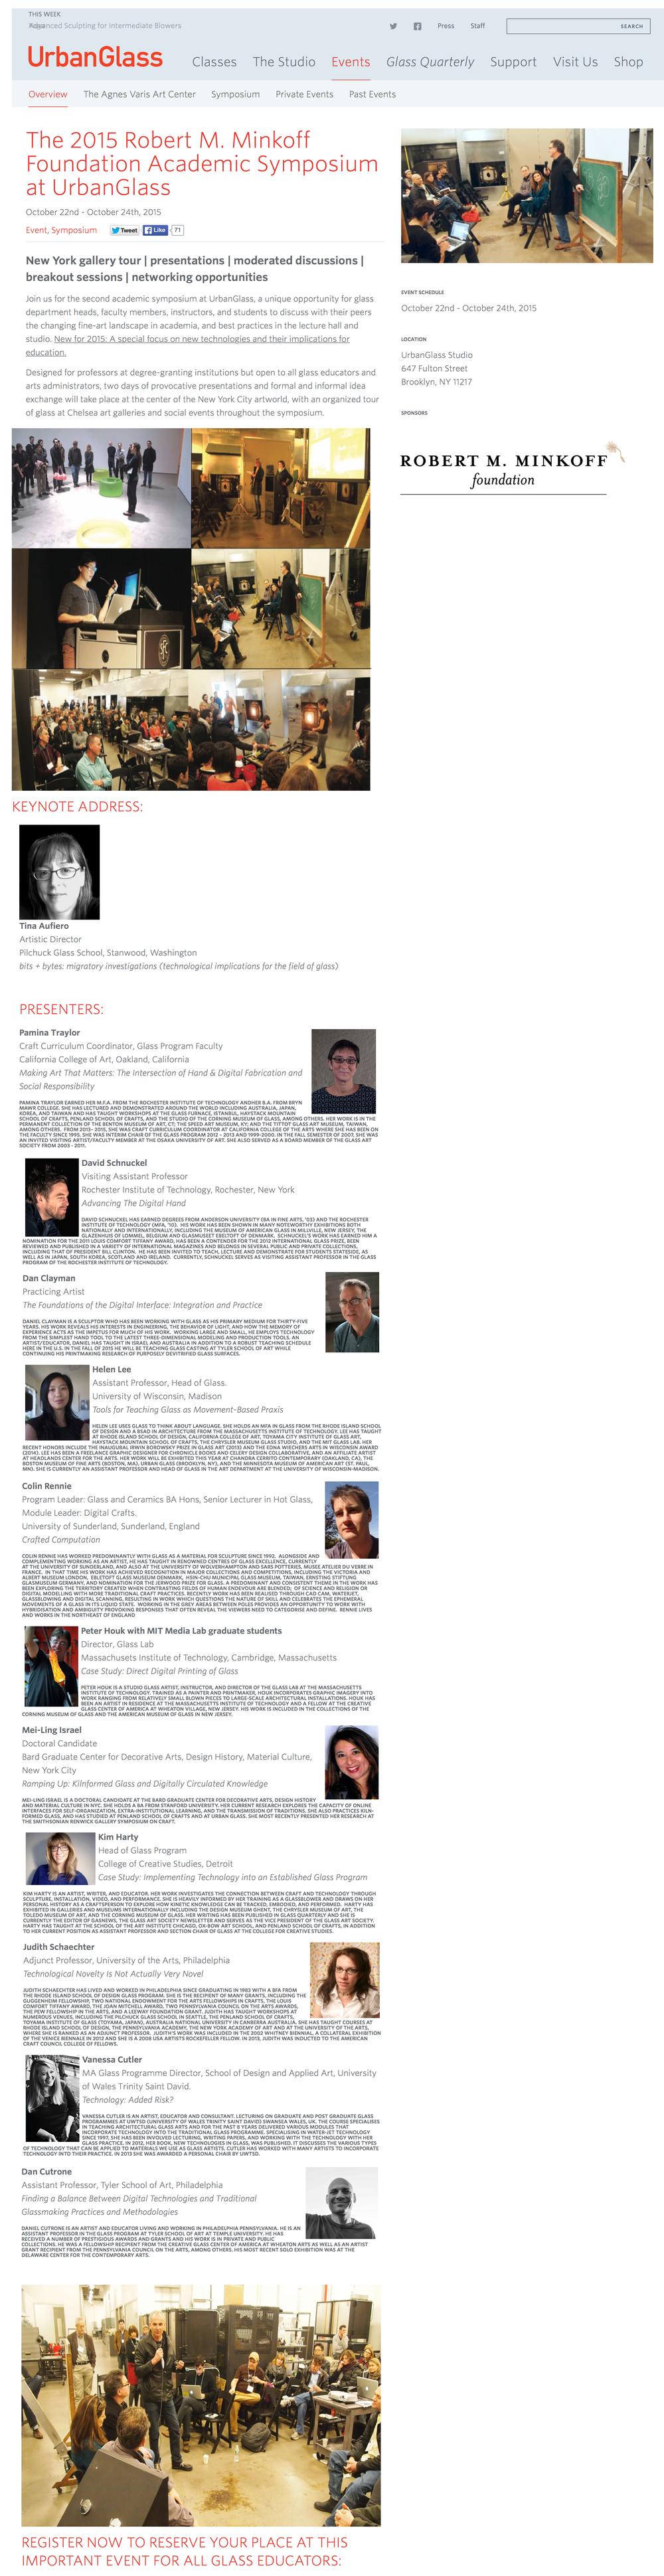 2015 Minkoff Foundation Academic Symposium